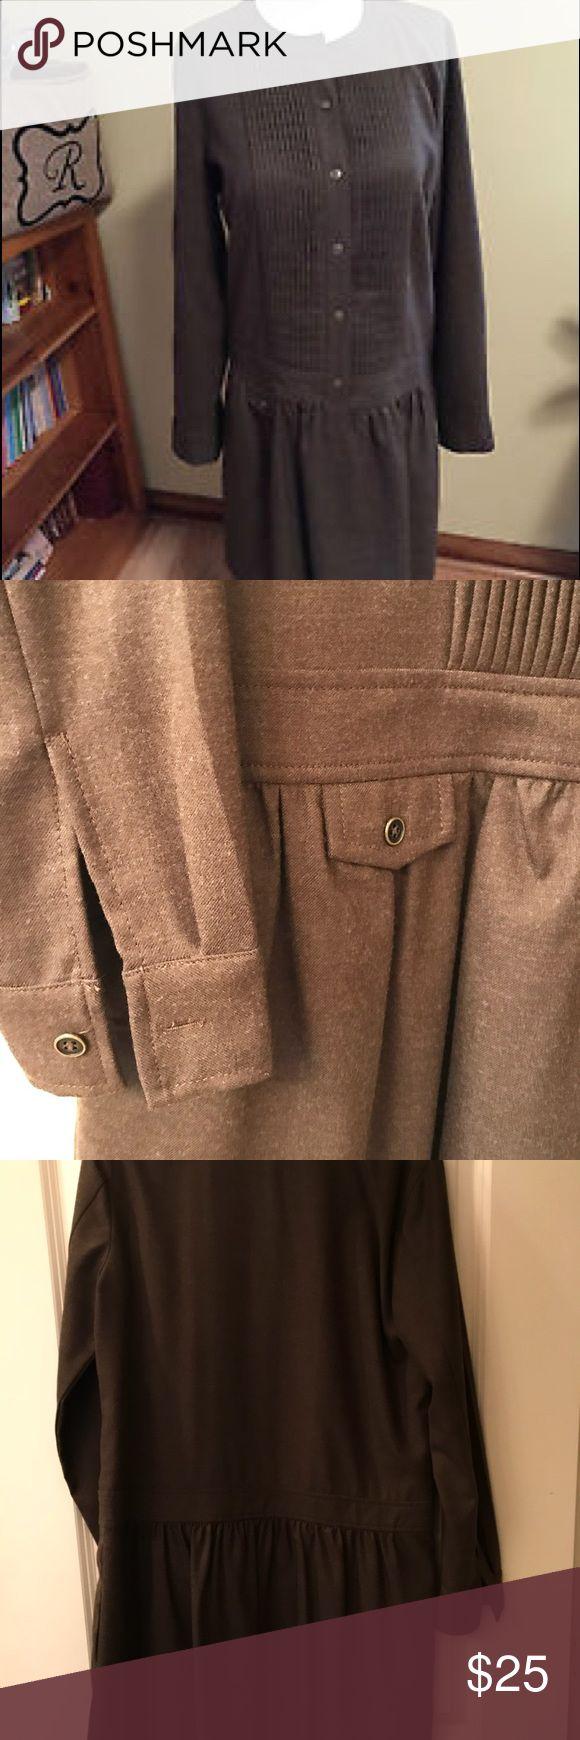 "J.Crew wool button front olive green dress - 10 J.Crew pin tuck dress - button front and at cuffs, 100% wool, olive green, size 10, one faux pocket. Length is 34"" shoulder to hem. J. Crew Dresses Mini"